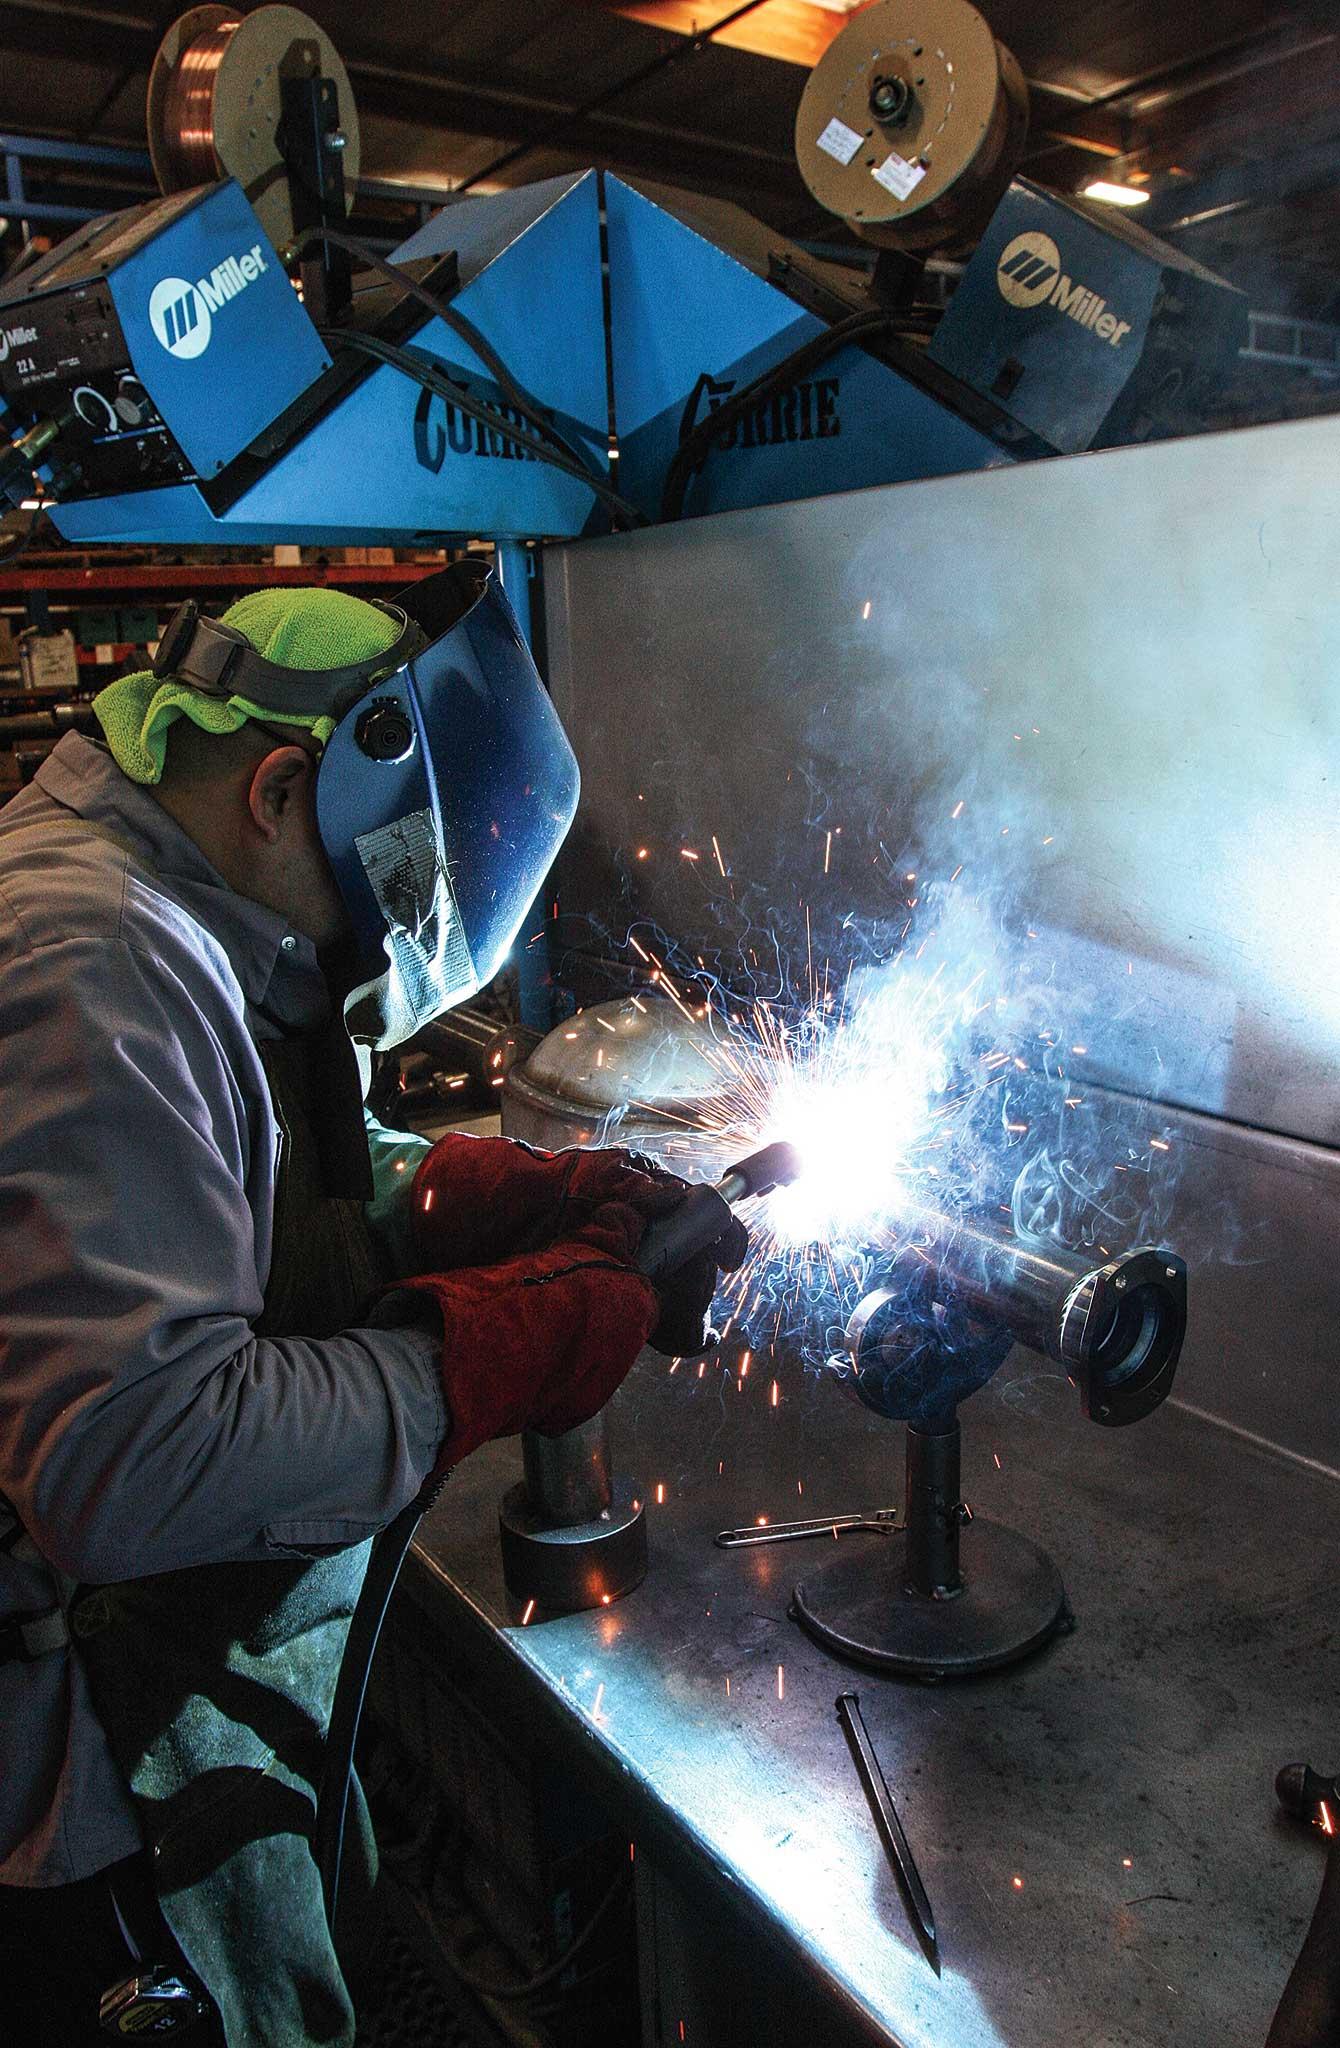 currie enterprises rear axles bearing housing assembly welding 007